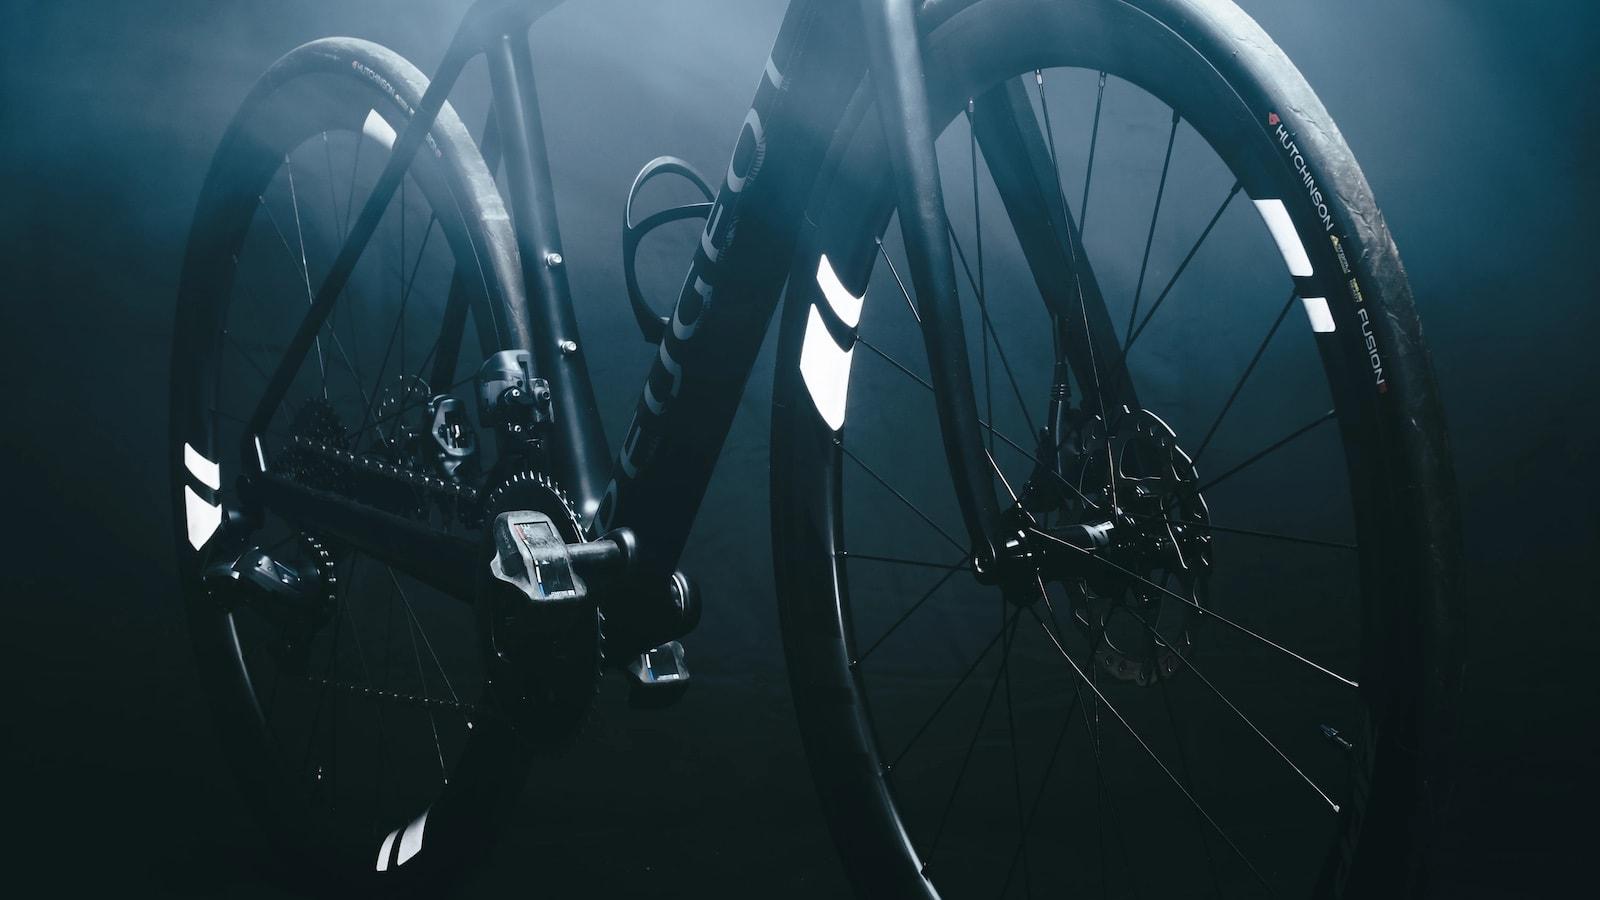 THE BEAM WHEEL FLASH 2.0 High-Vis Bike Reflectors